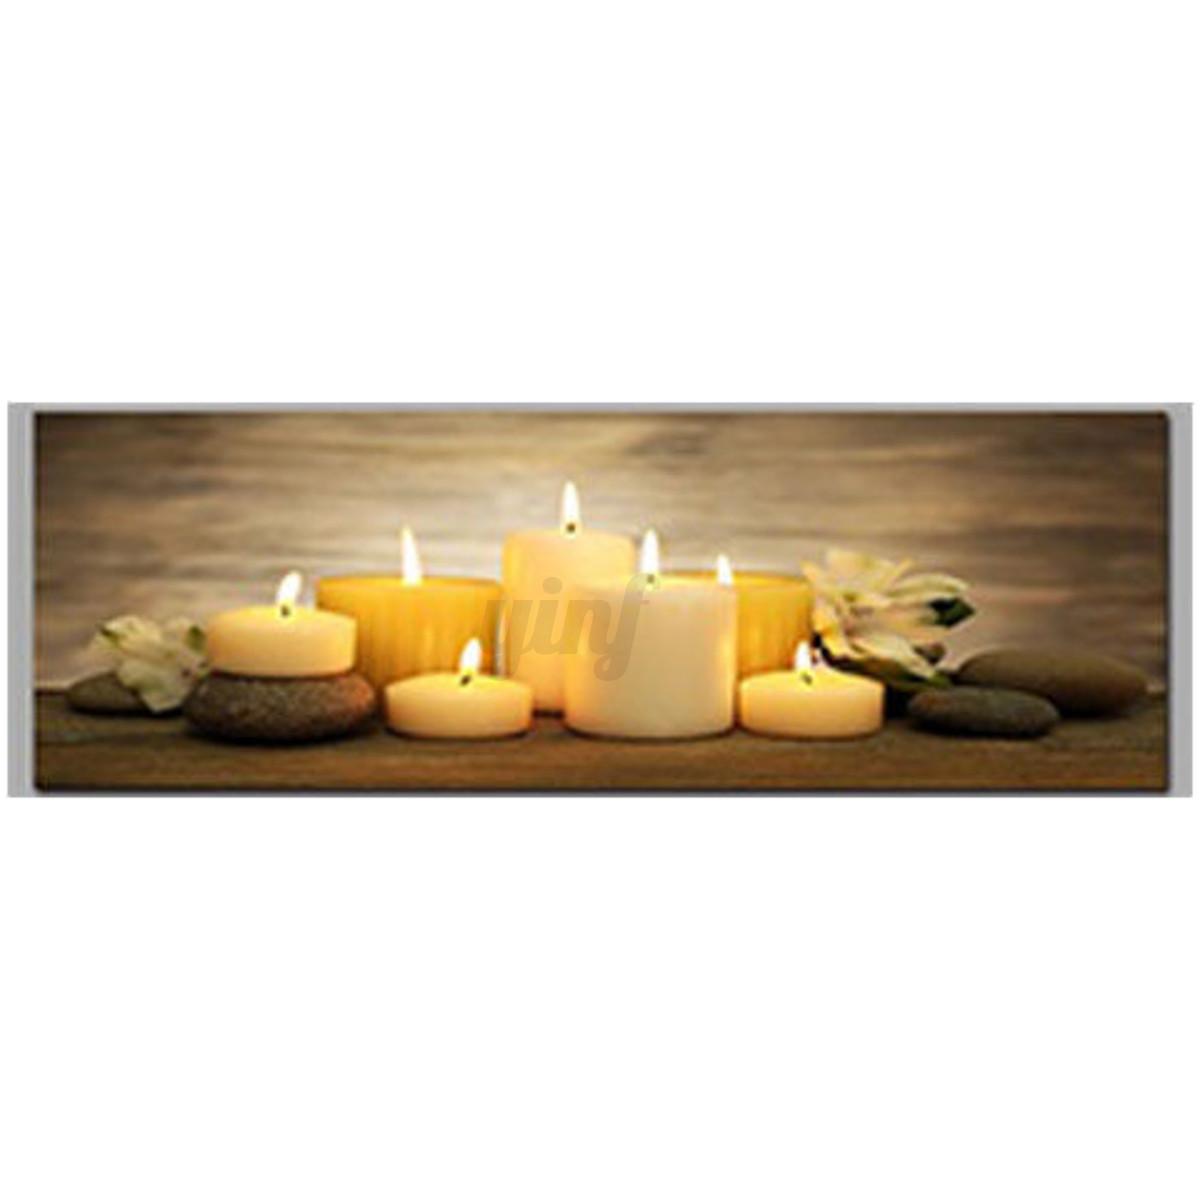 christmas led light up luminous framed painting canvas. Black Bedroom Furniture Sets. Home Design Ideas